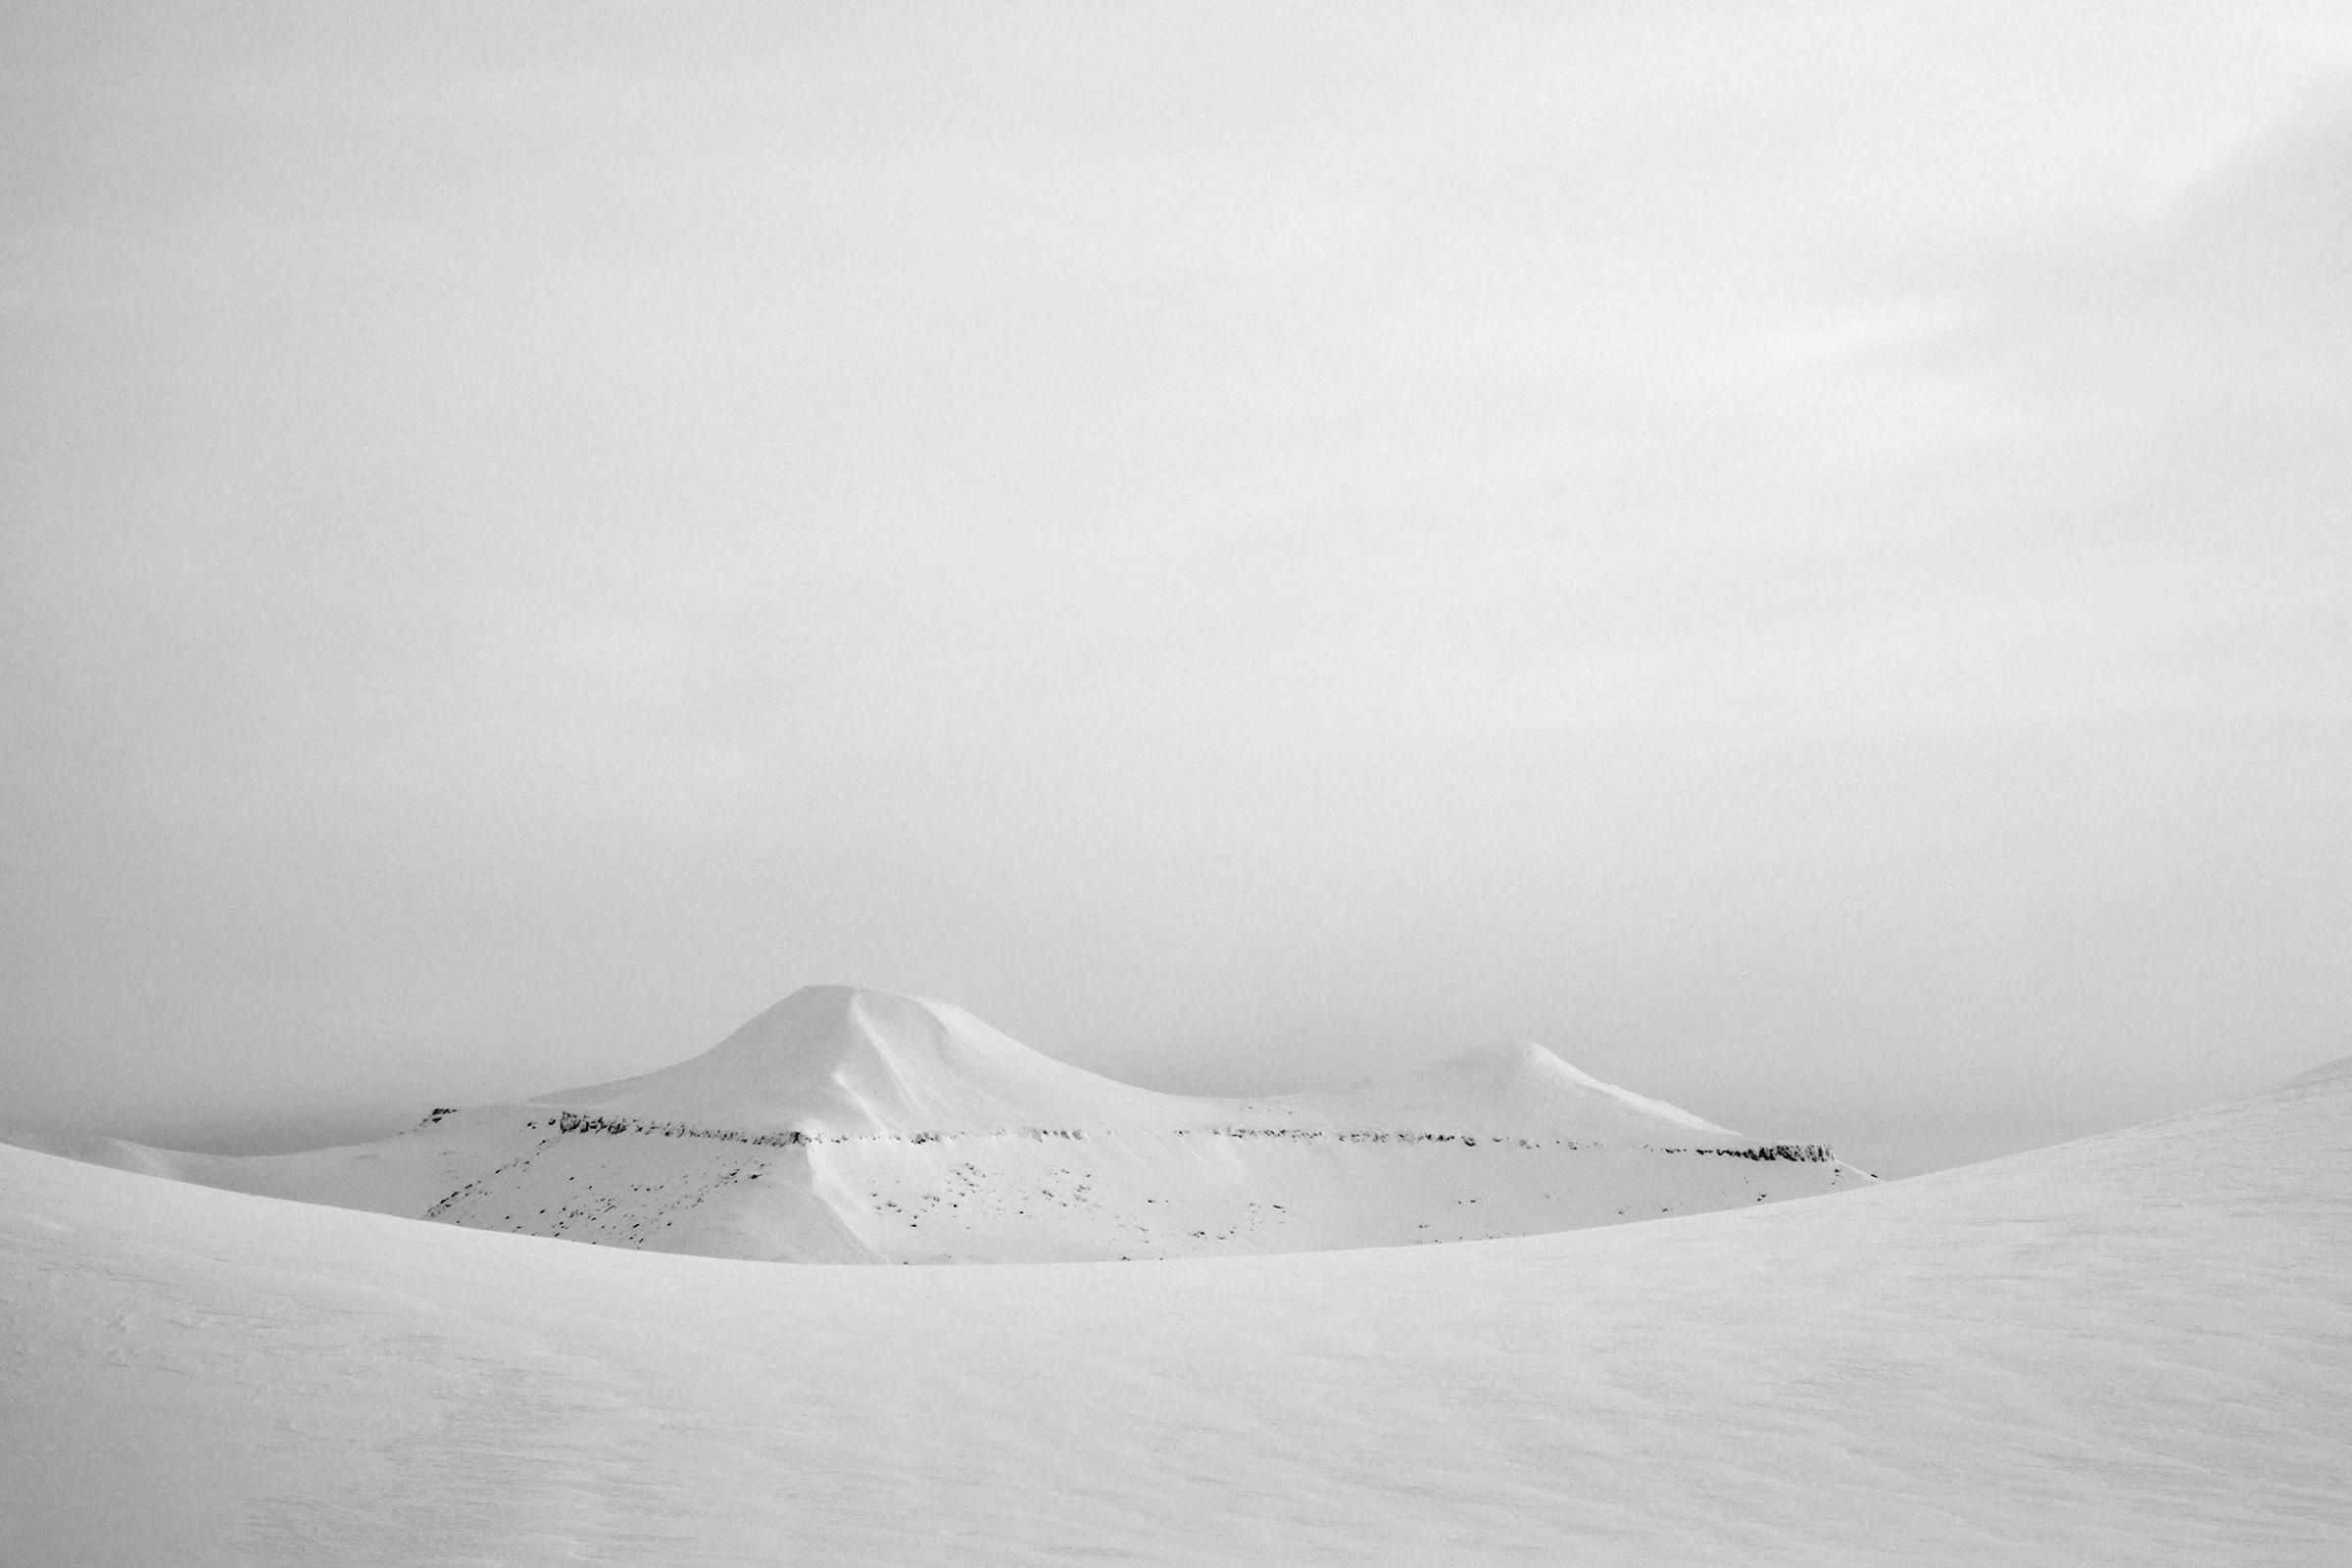 Såtebreen, Svalbard, Foto: Martin Hülle